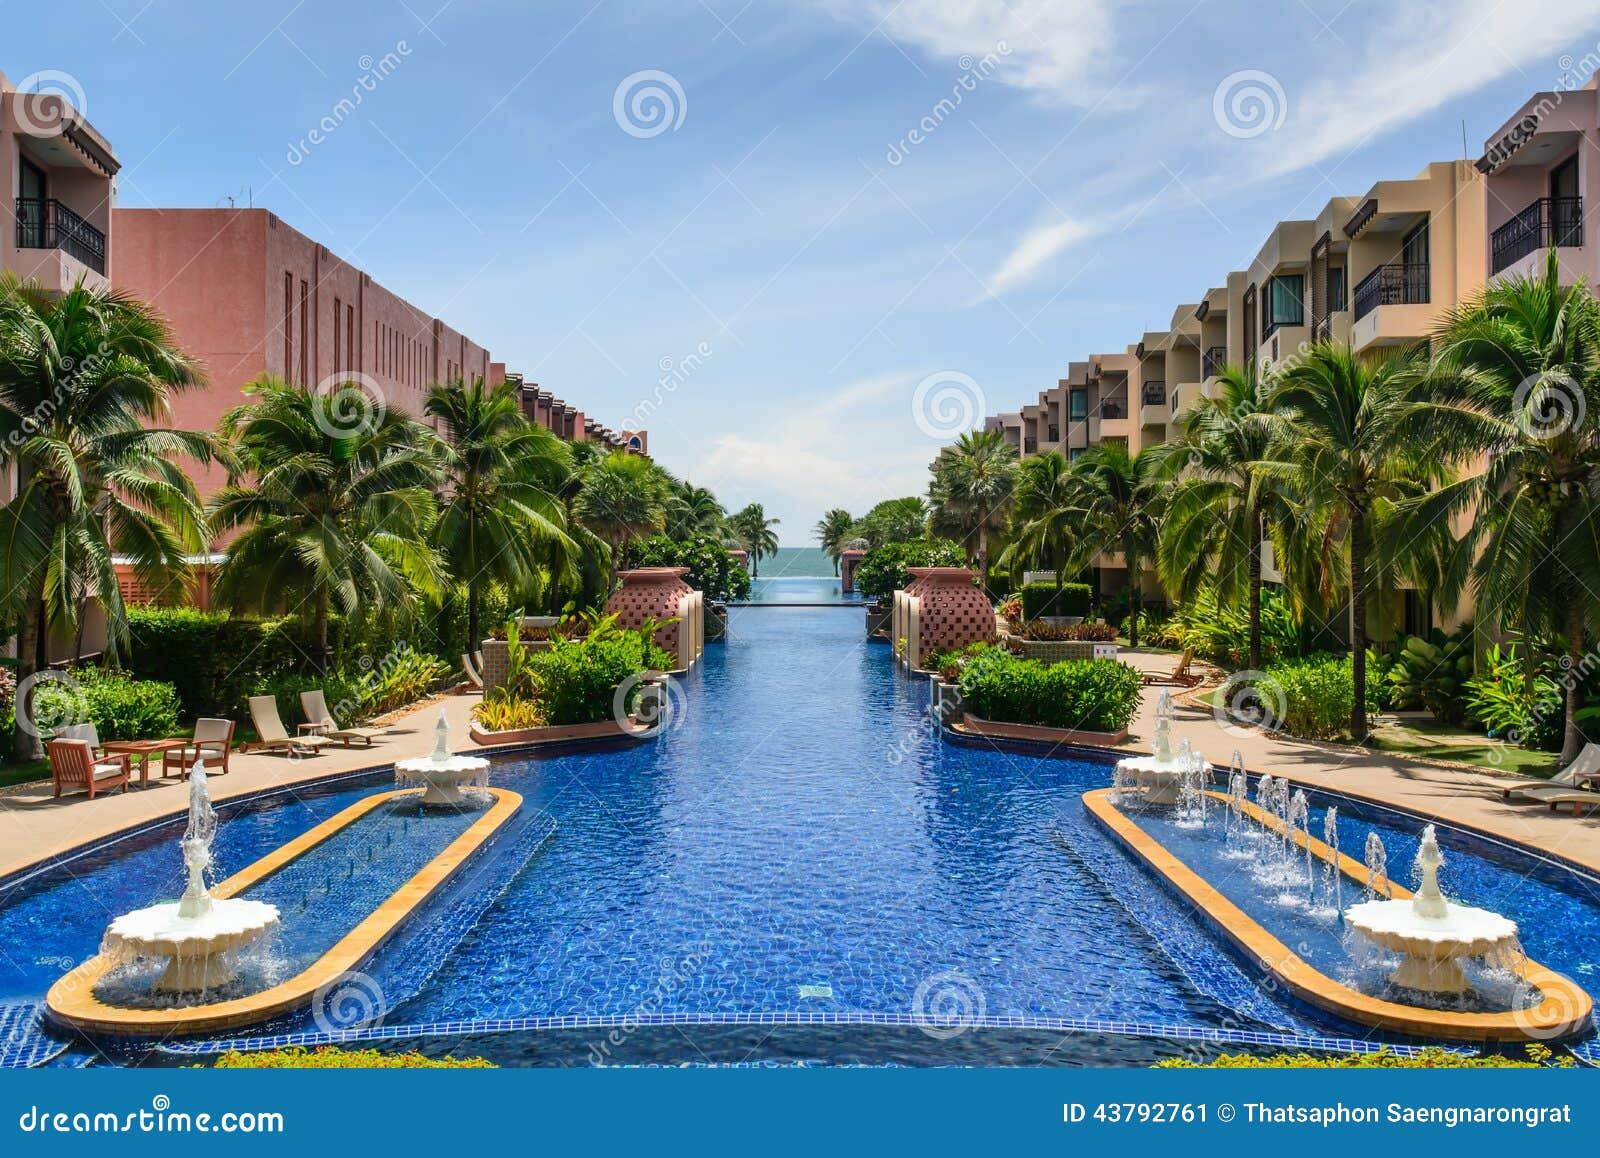 Belle piscine dans l 39 h tel tha lande photo stock image for Piscine a debordement thailande